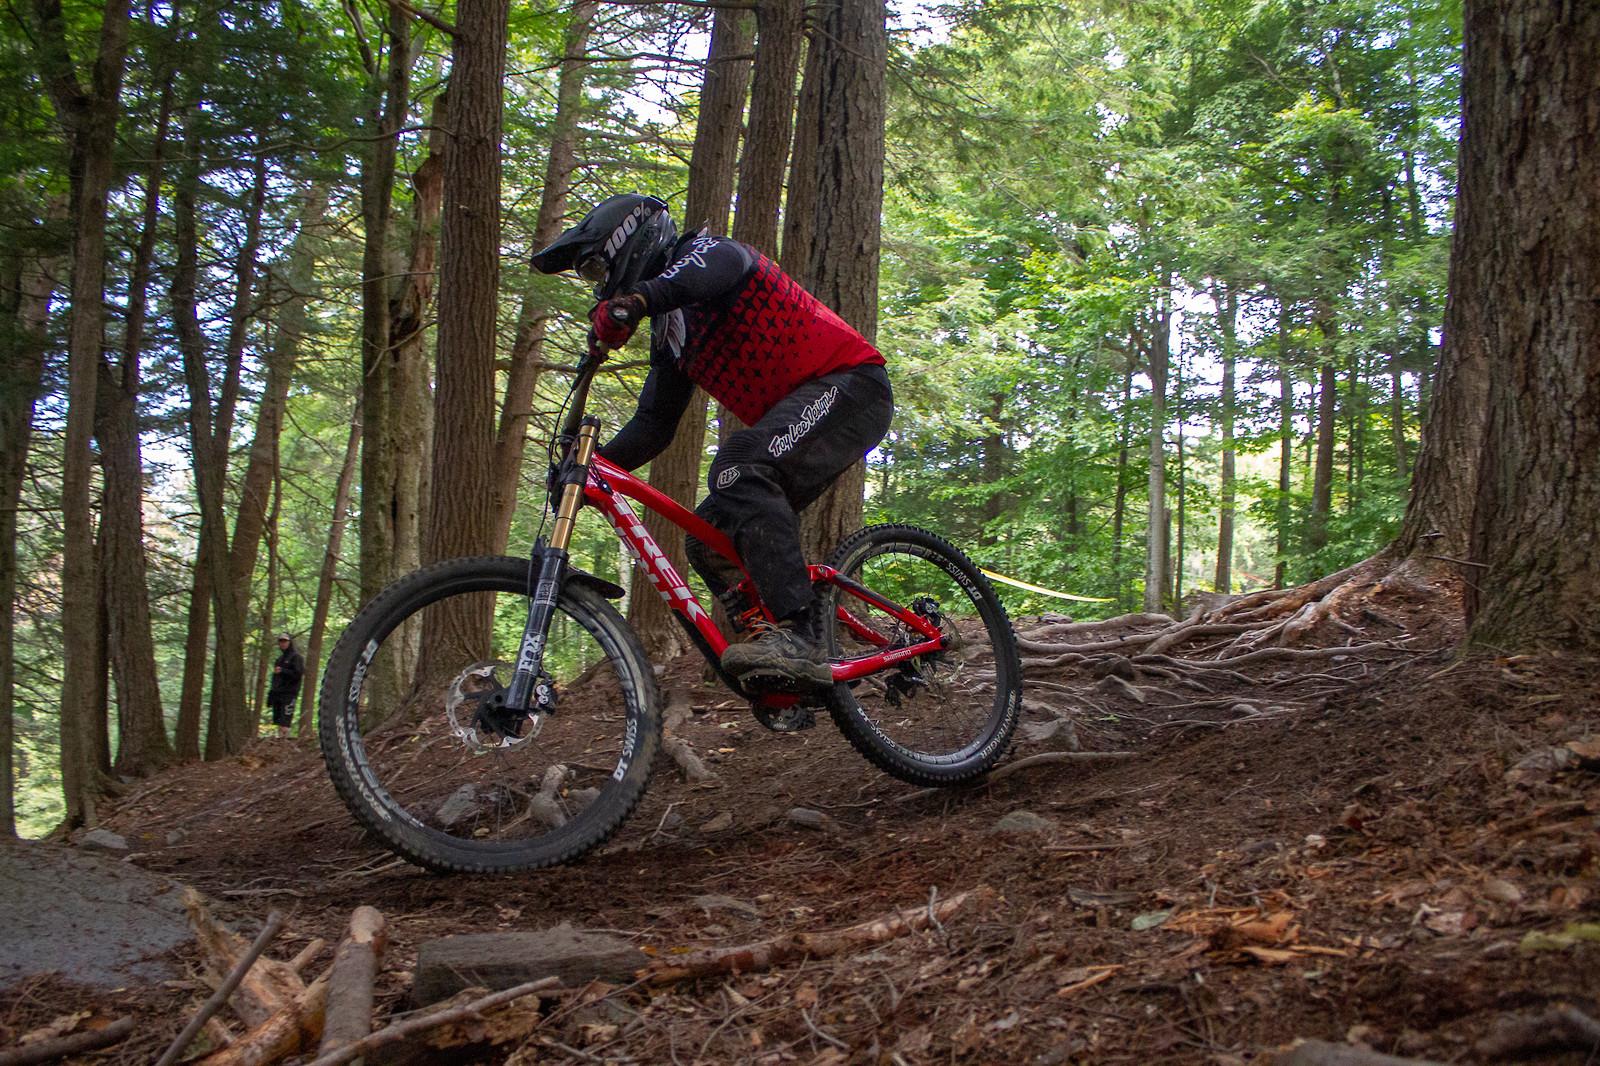 Renato DaSilva - JackRice - Mountain Biking Pictures - Vital MTB